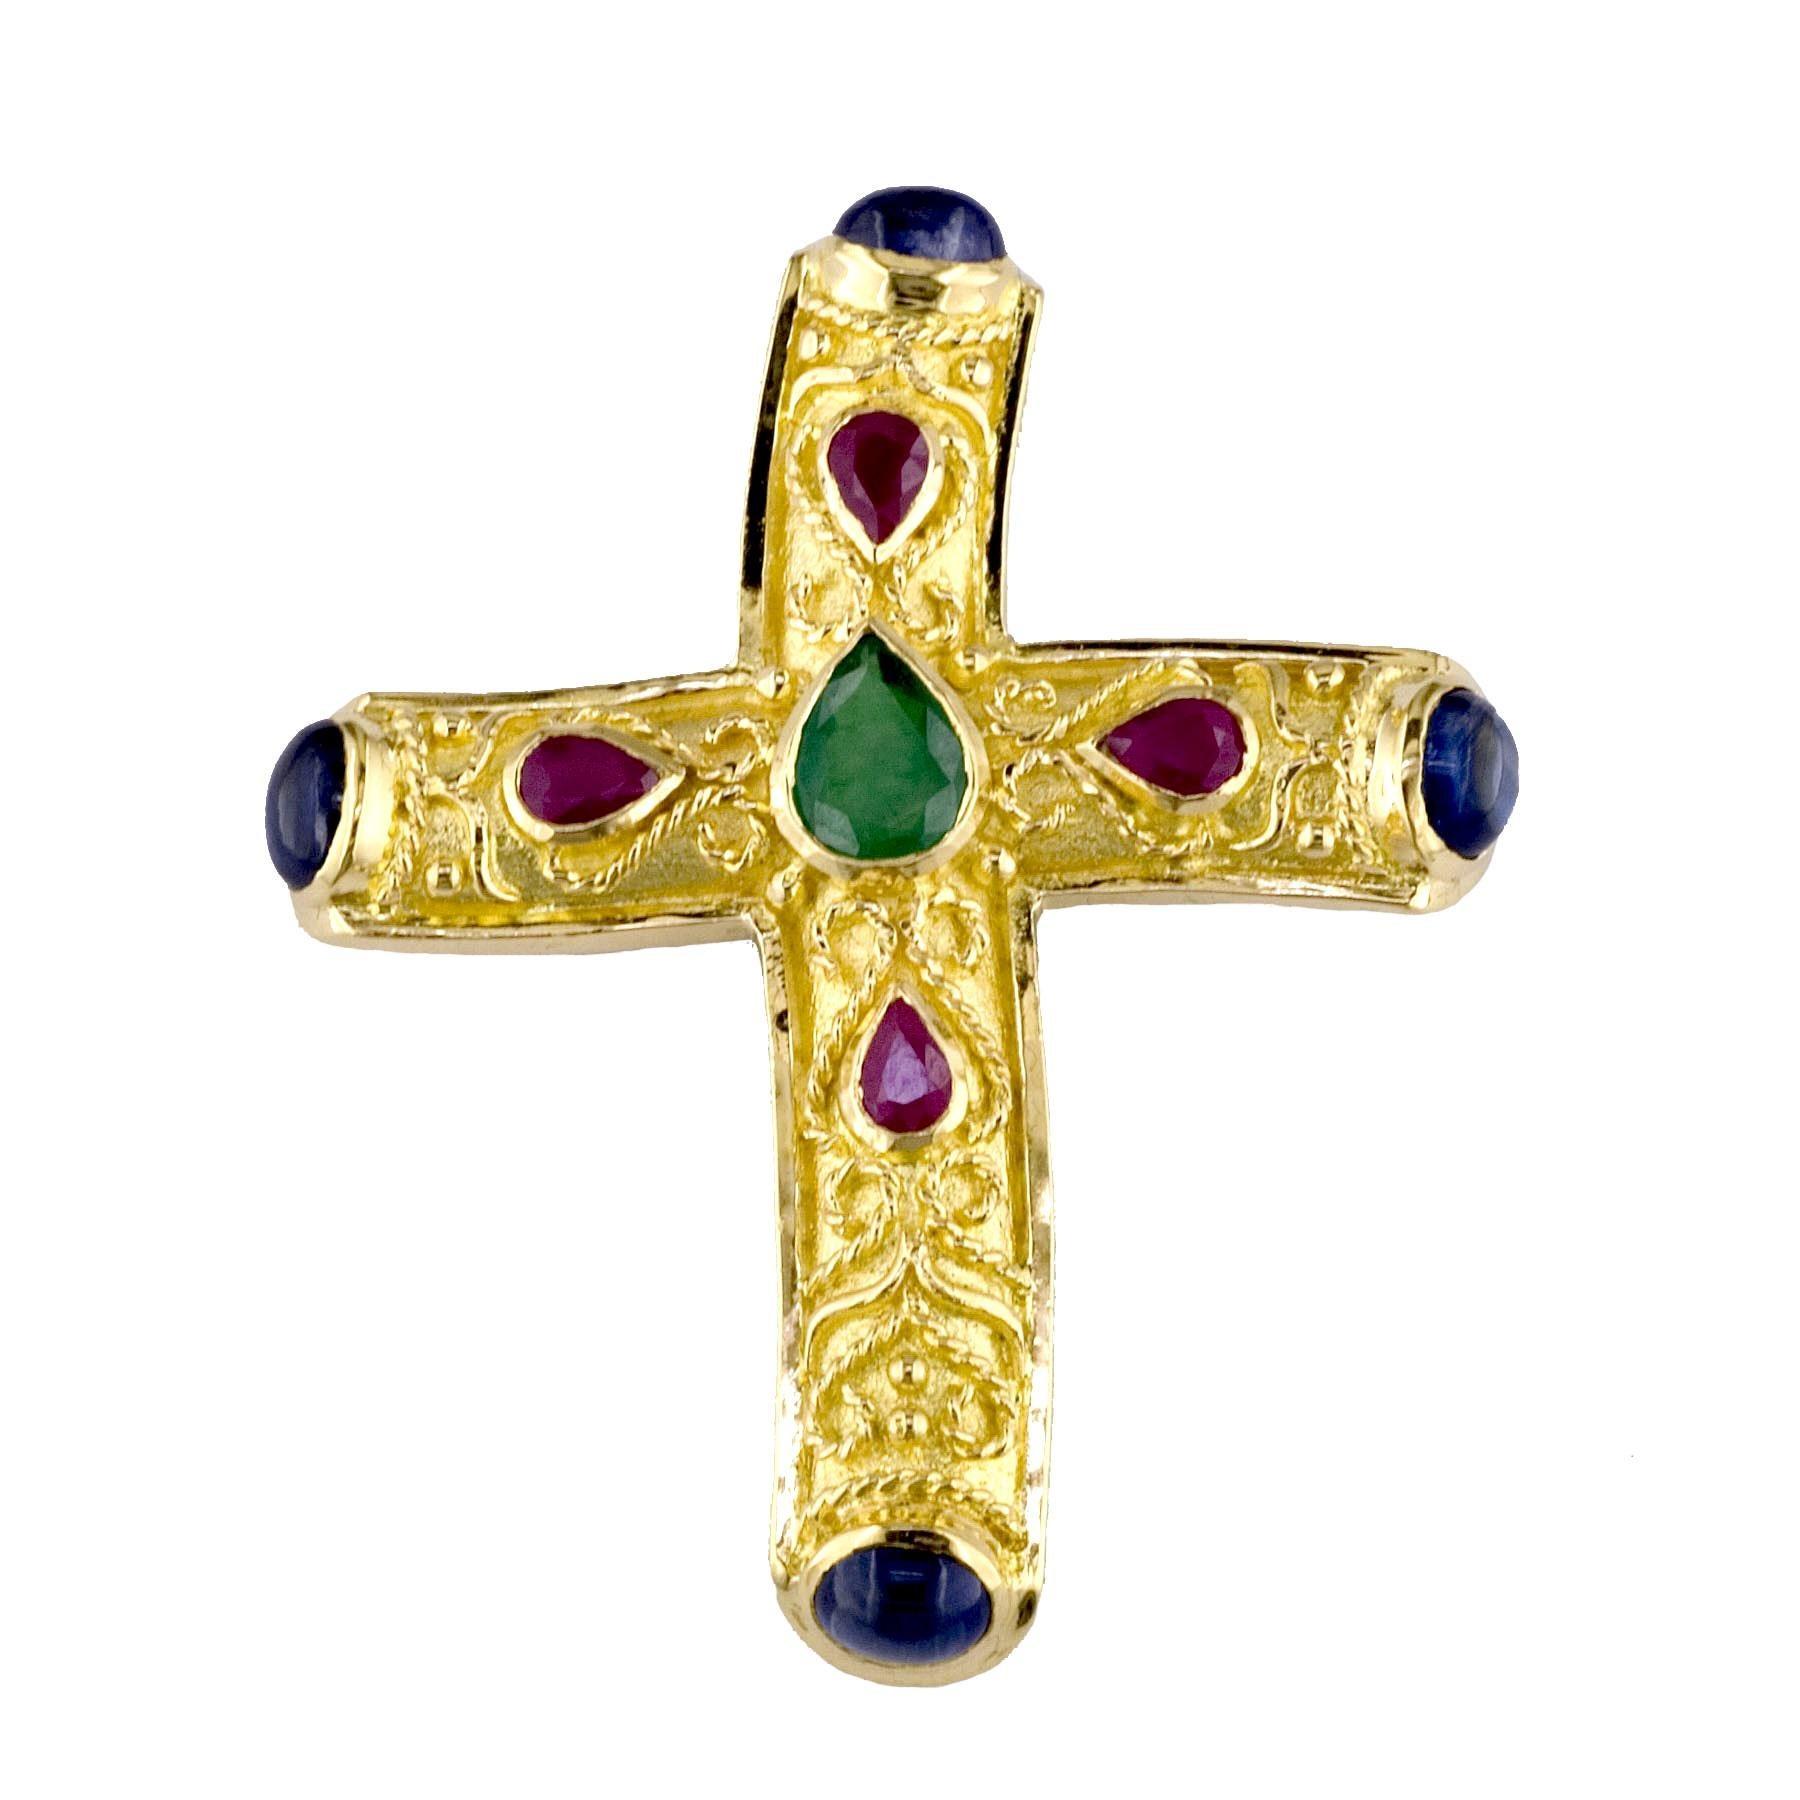 Georgios Collection 18 Karat Gold Emerald, Ruby, Sapphire Byzantine Cross